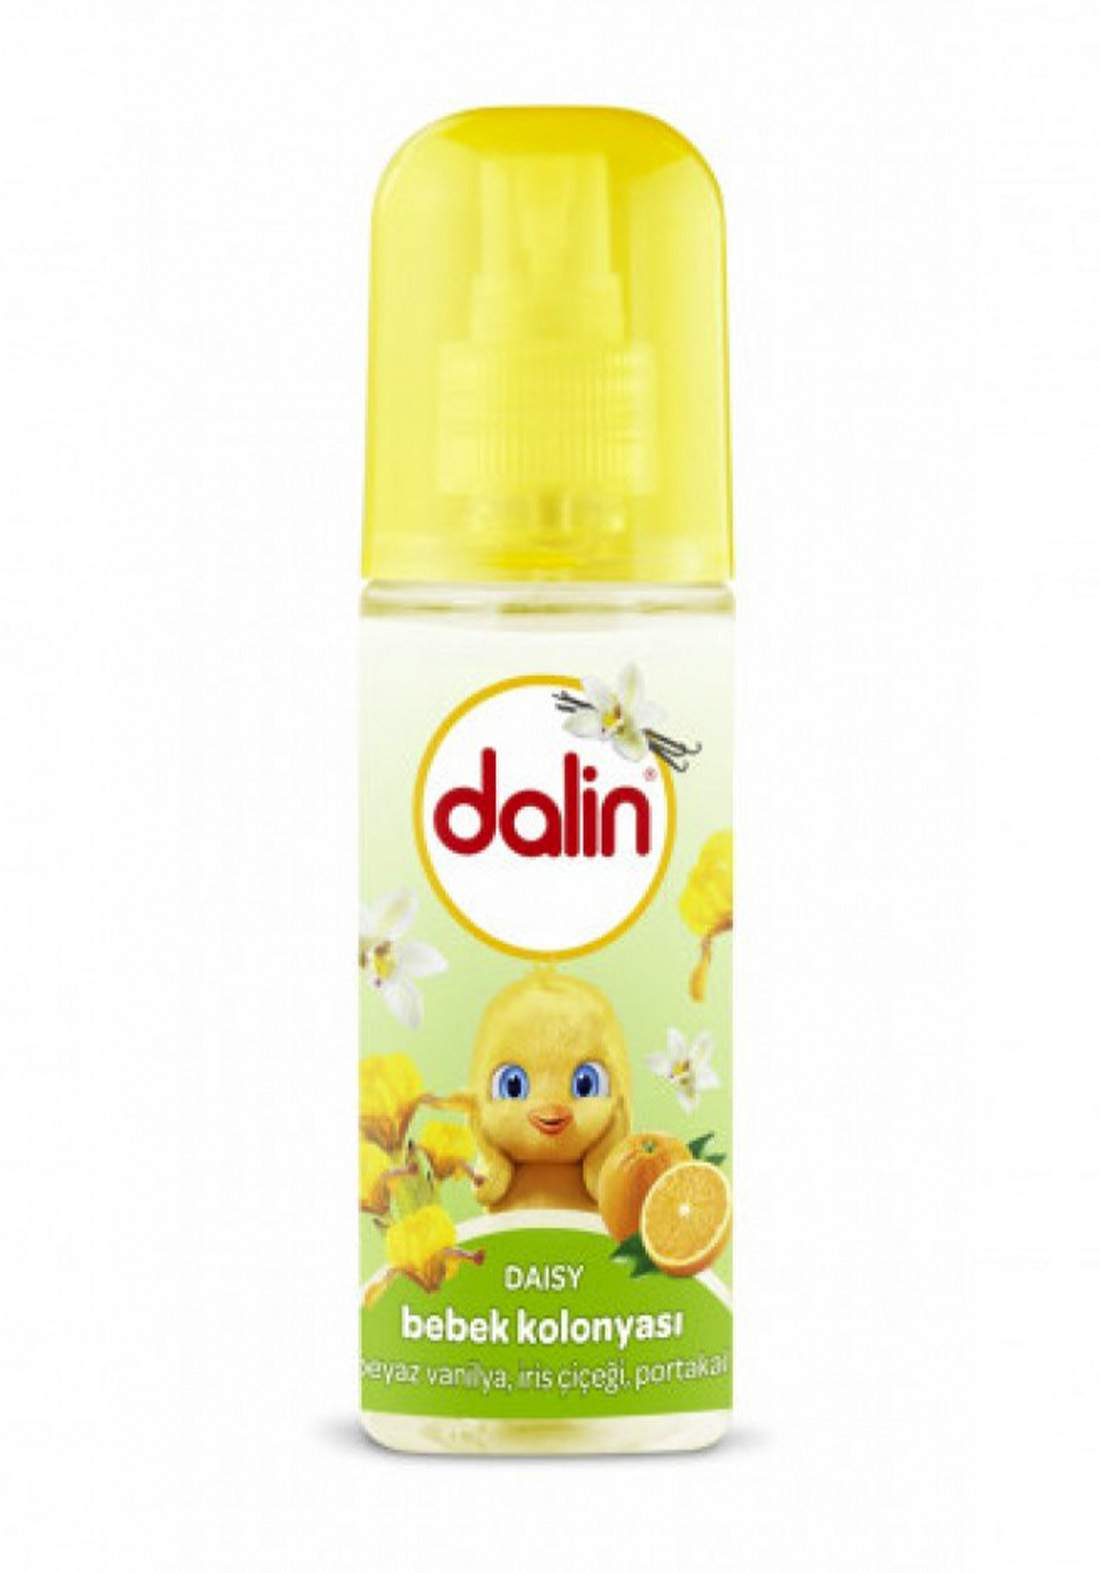 Dalin Daisy Baby 150 ml كولونيا للأطفال